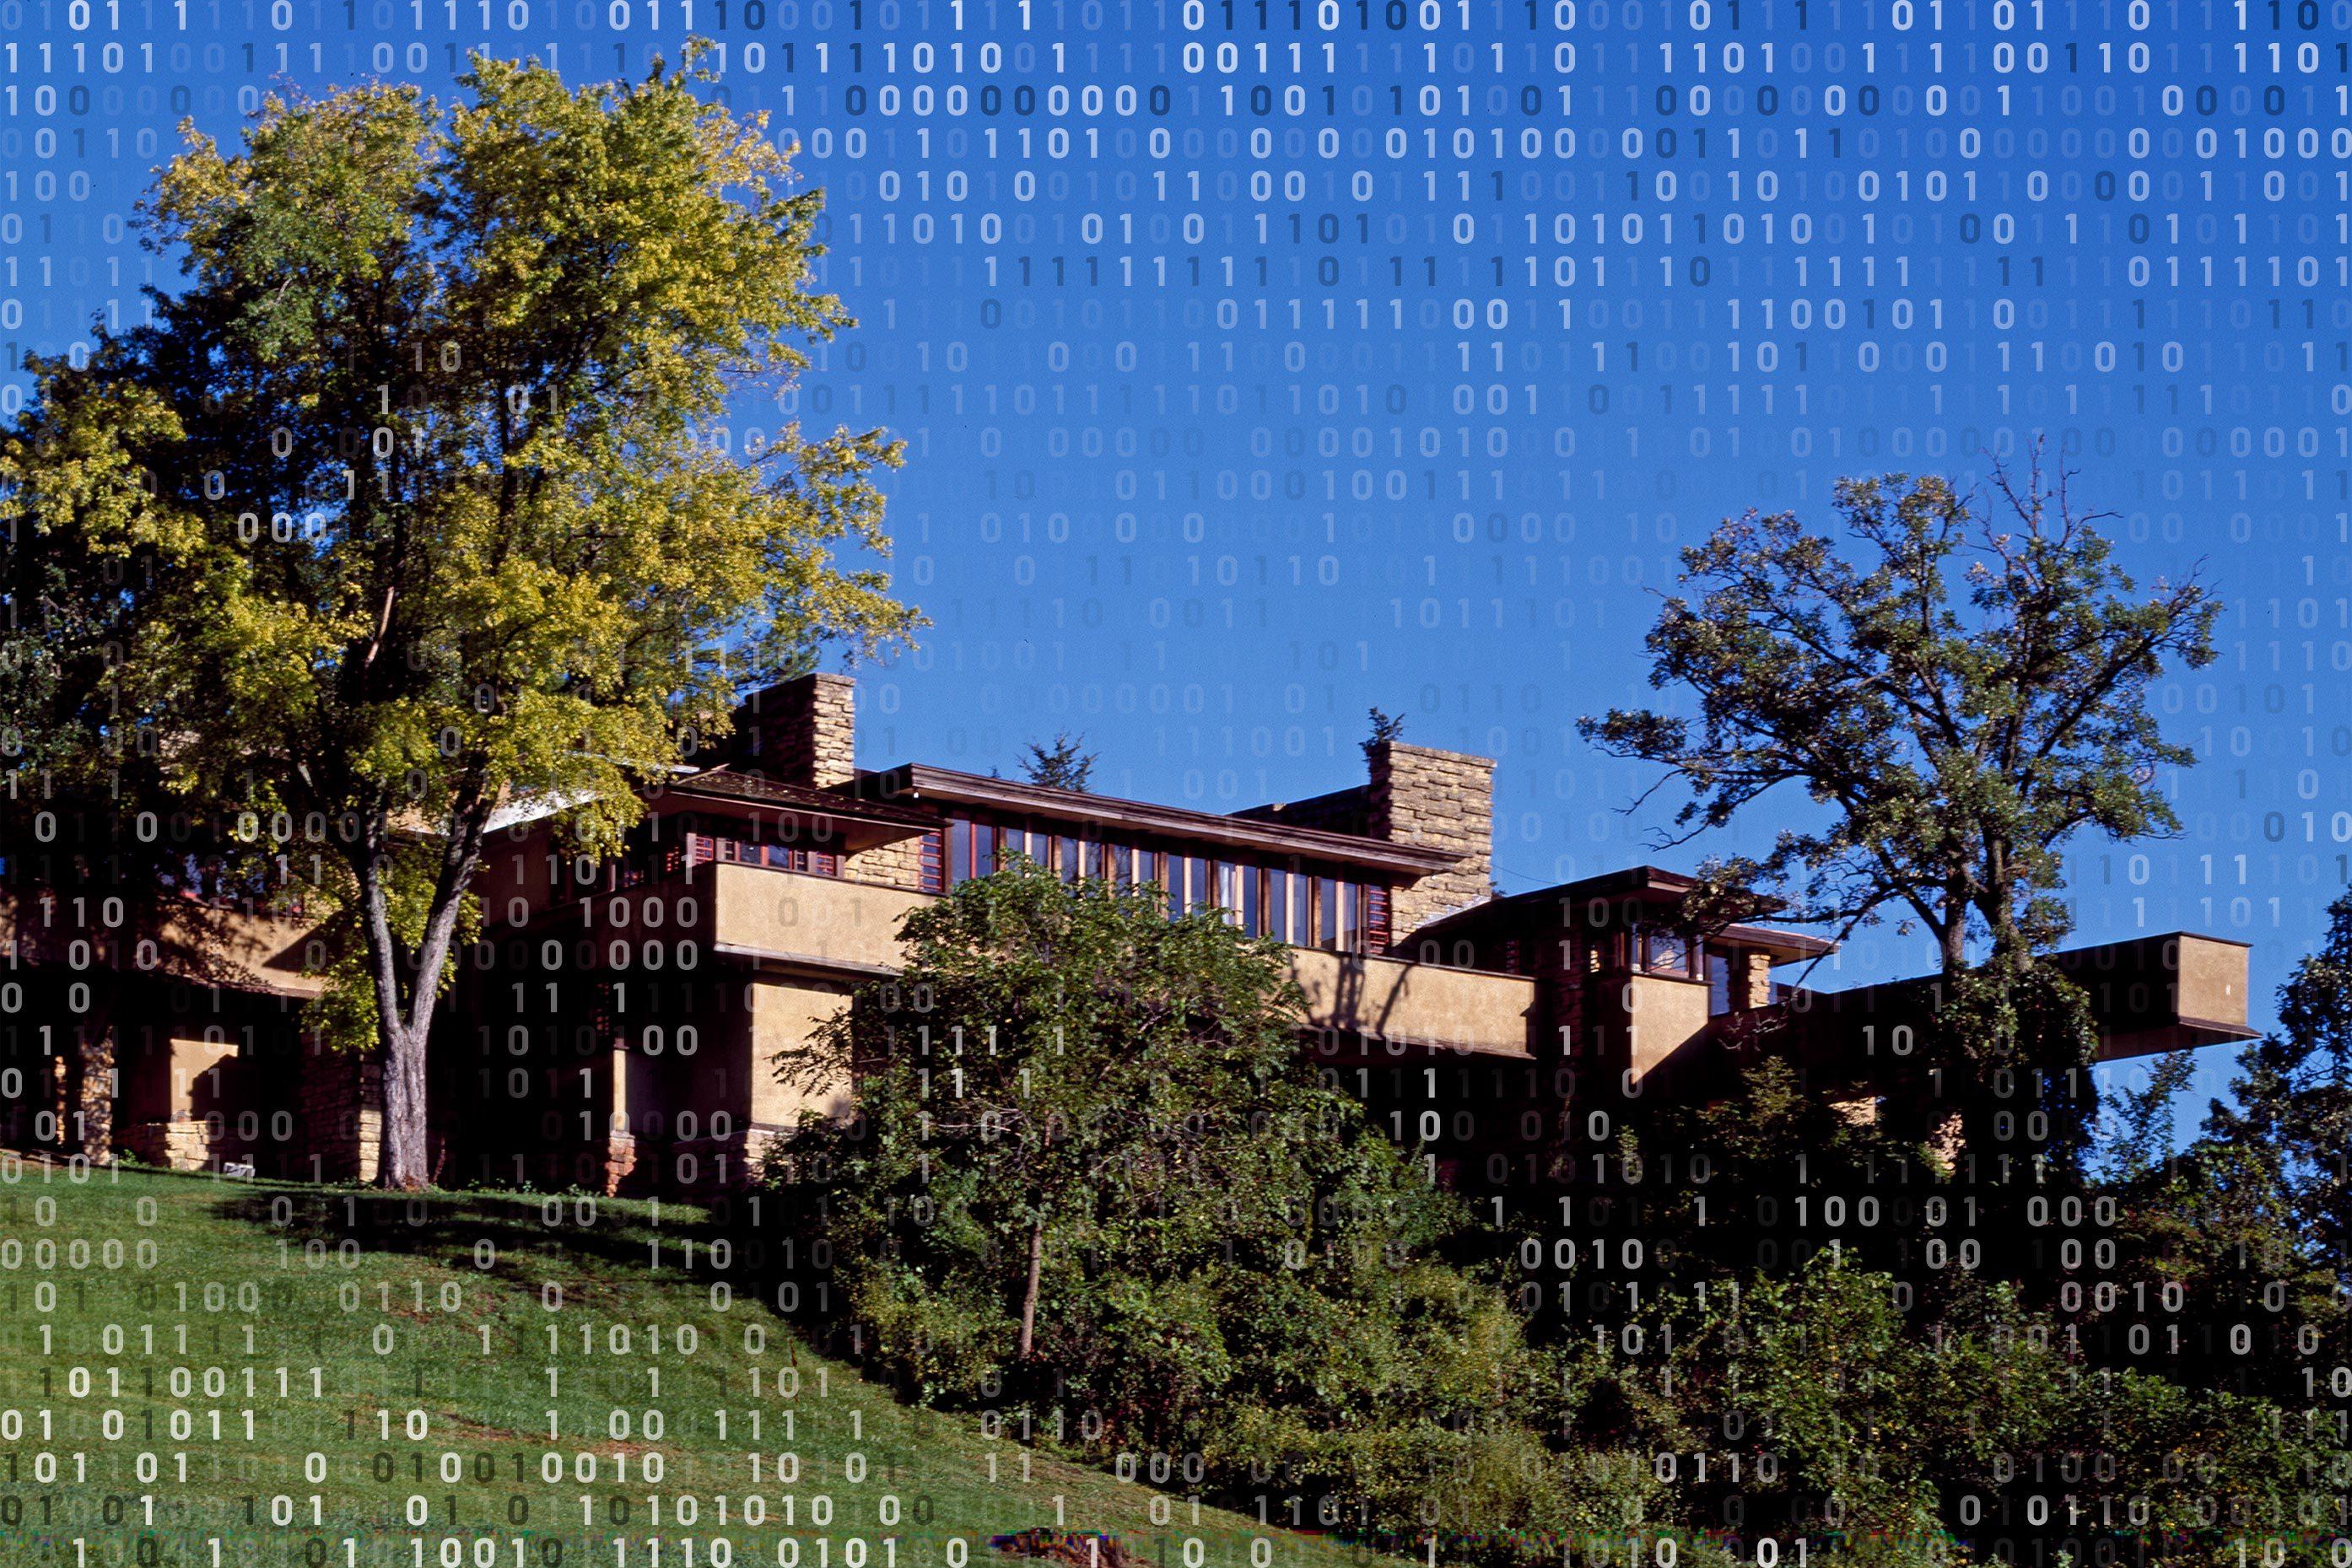 frank lloyd wright's house with computer binary code overlay